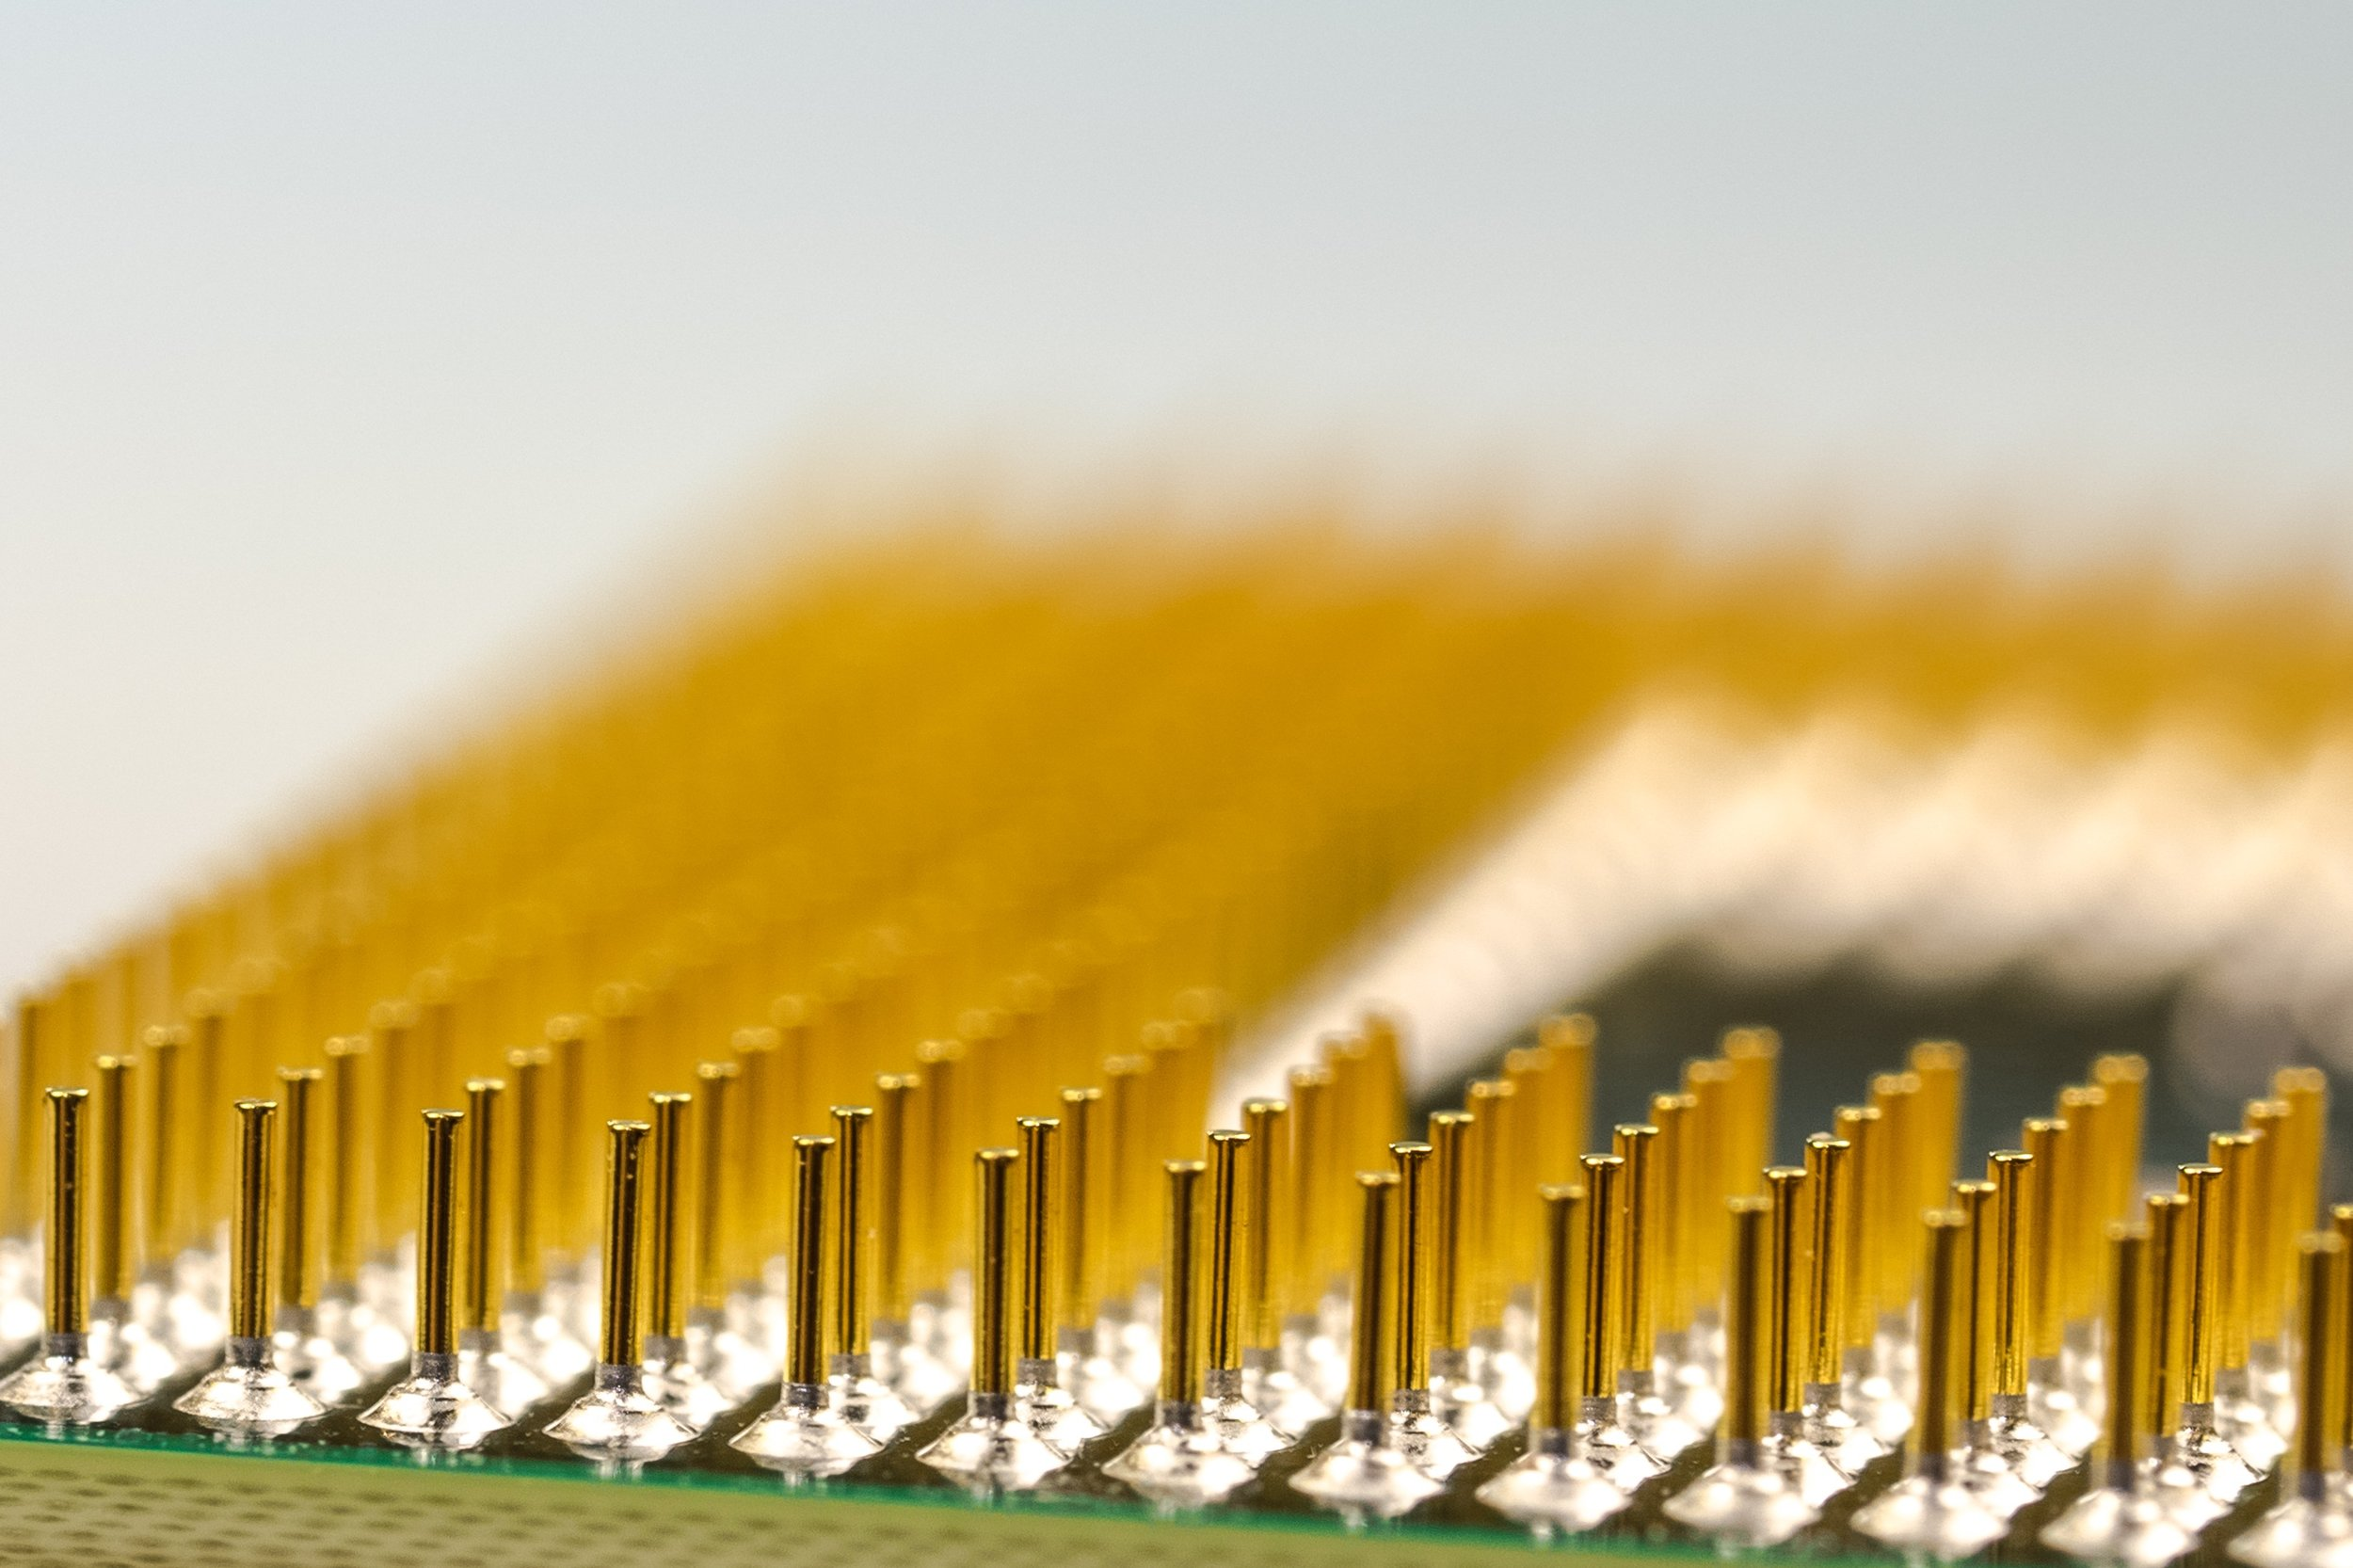 pins-cpu-processor-macro-40848.jpeg